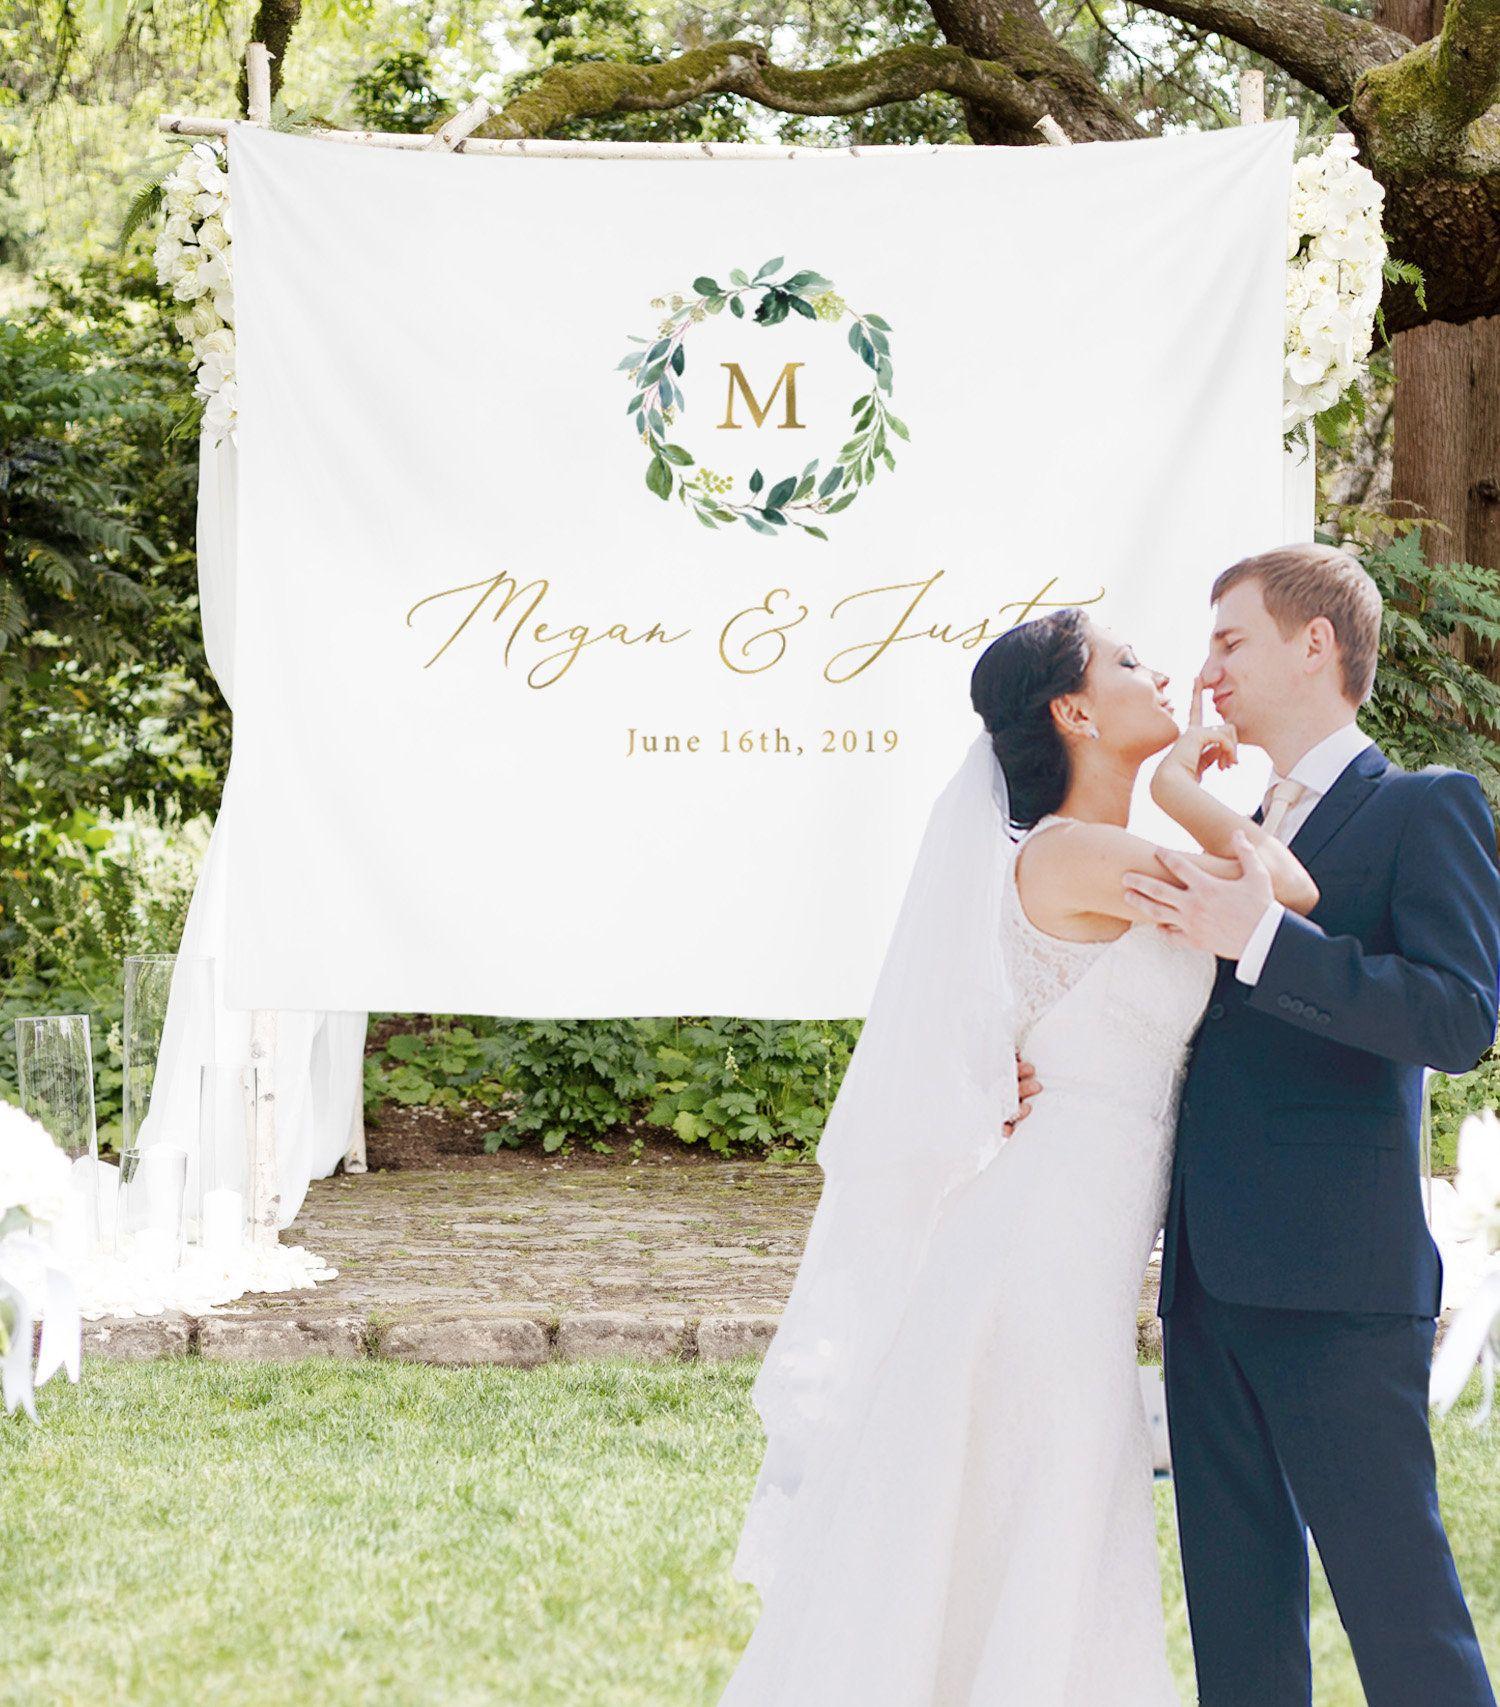 Personalized Wedding Backdrop For Reception Monogram Etsy Bridal Shower Backdrop Rustic Wedding Banner Wedding Banner